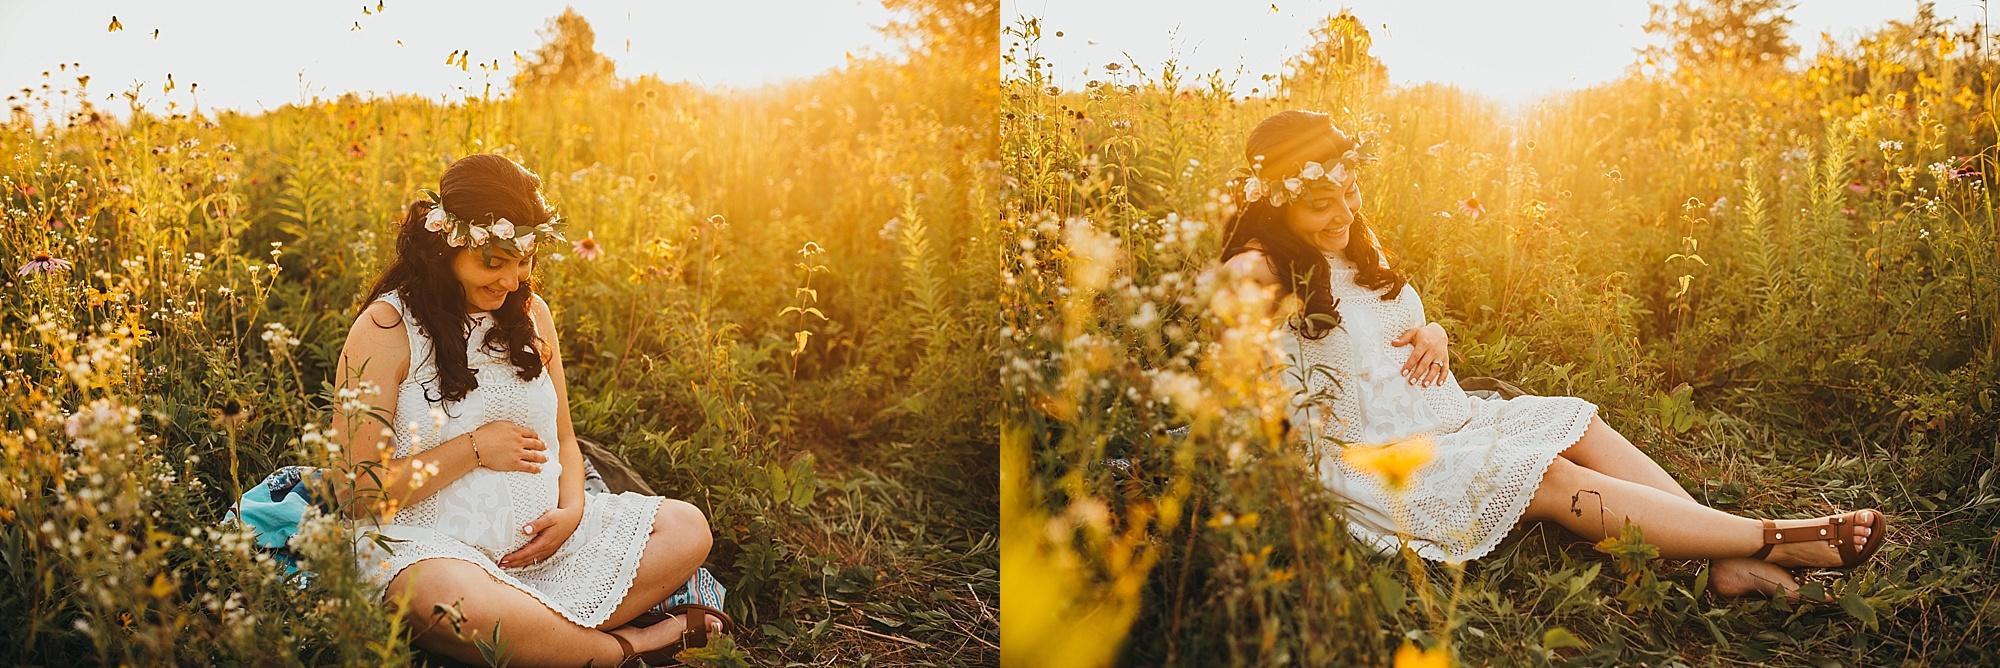 lauren-grayson-photography-cleveland-ohio-photographer-maternity-summer-outdoor-bohemian-fields-session_0495.jpg